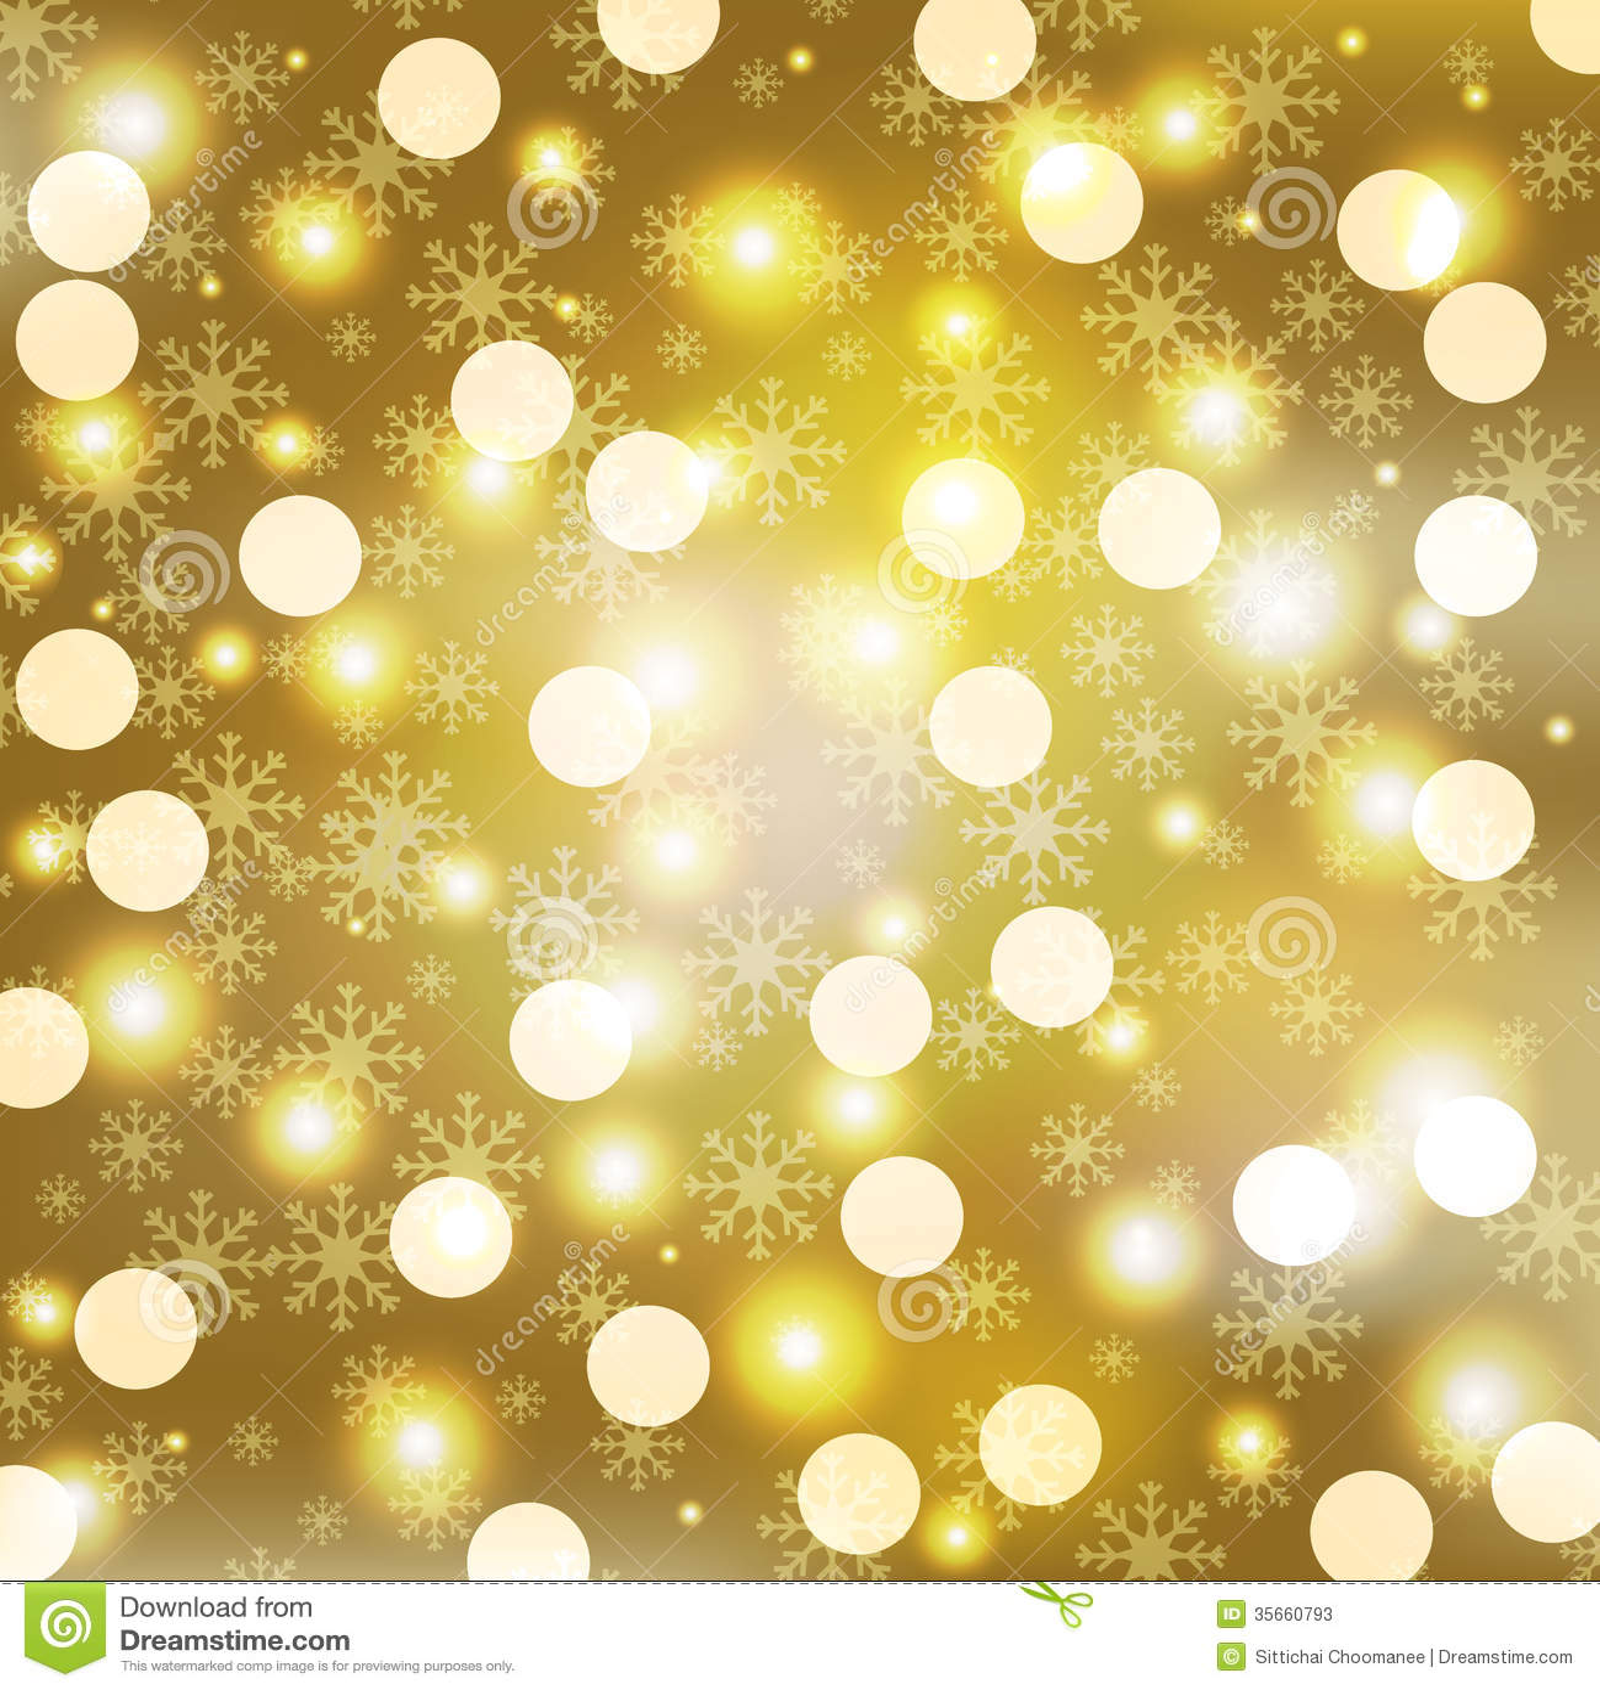 Christmas Desktop Background.Christmas Desktop Backgrounds Stock Vector Illustration Of